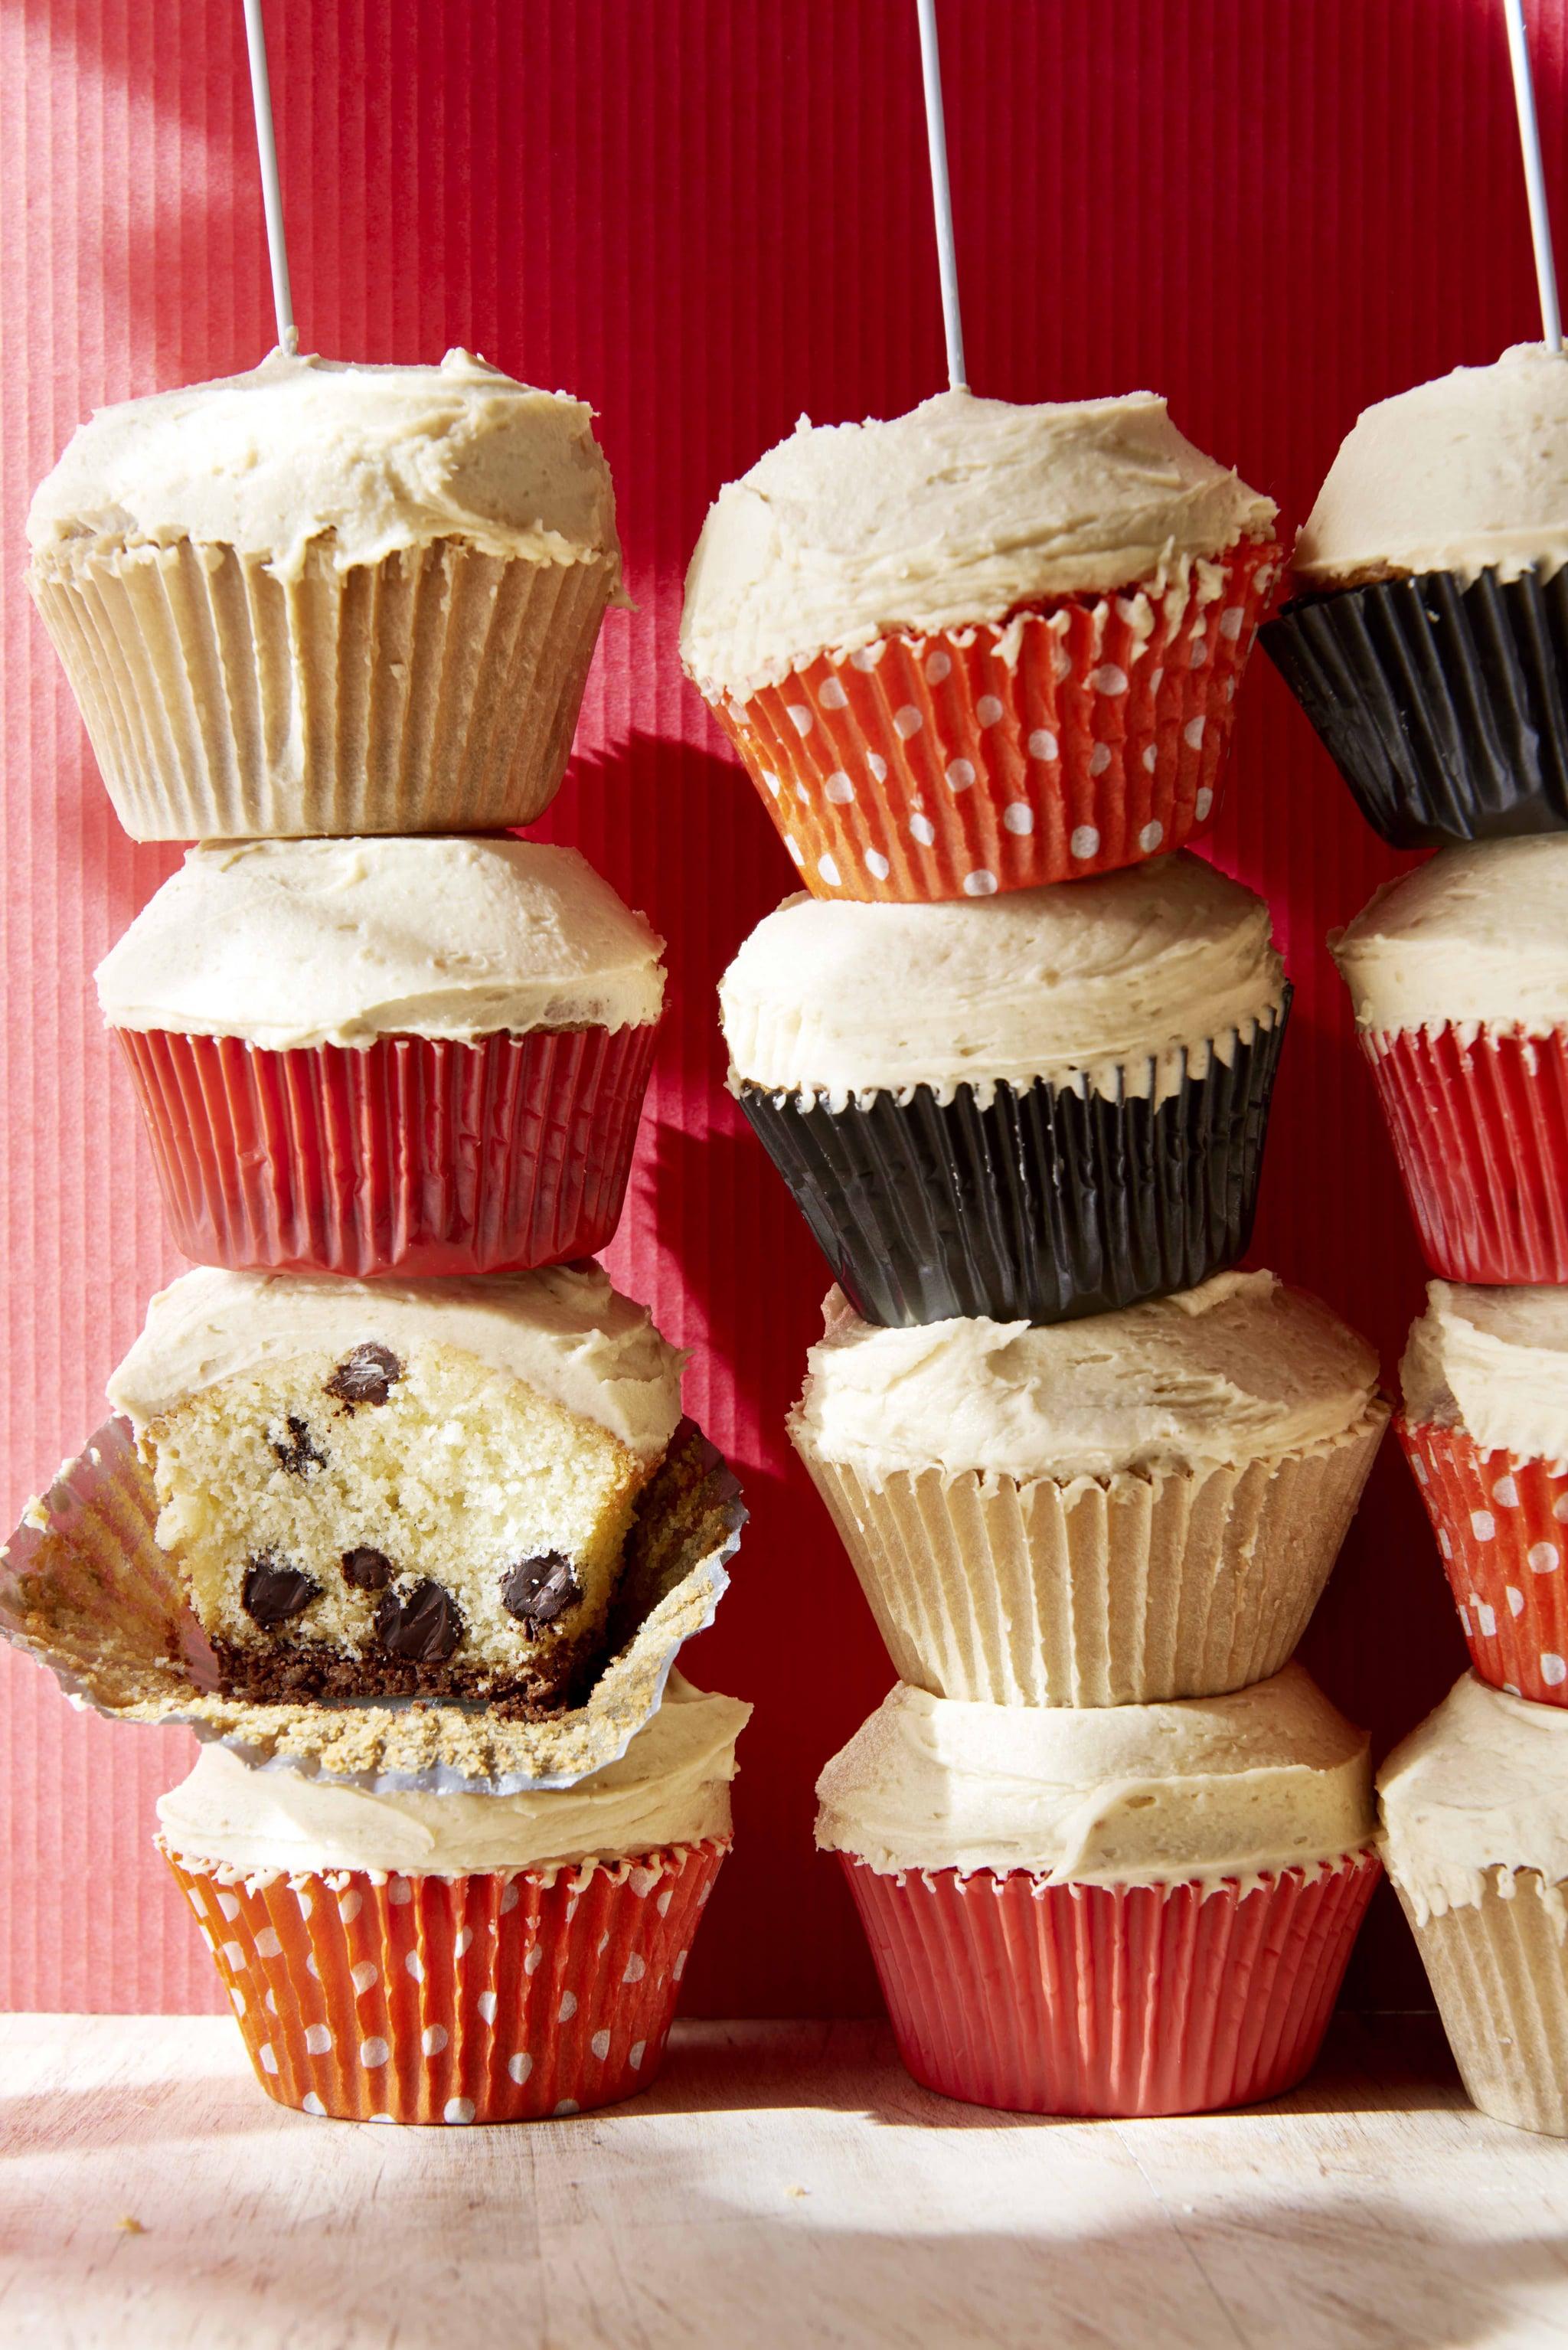 Sprinkles Chocolate Chip Cookie Cupcakes Recipe | POPSUGAR Food